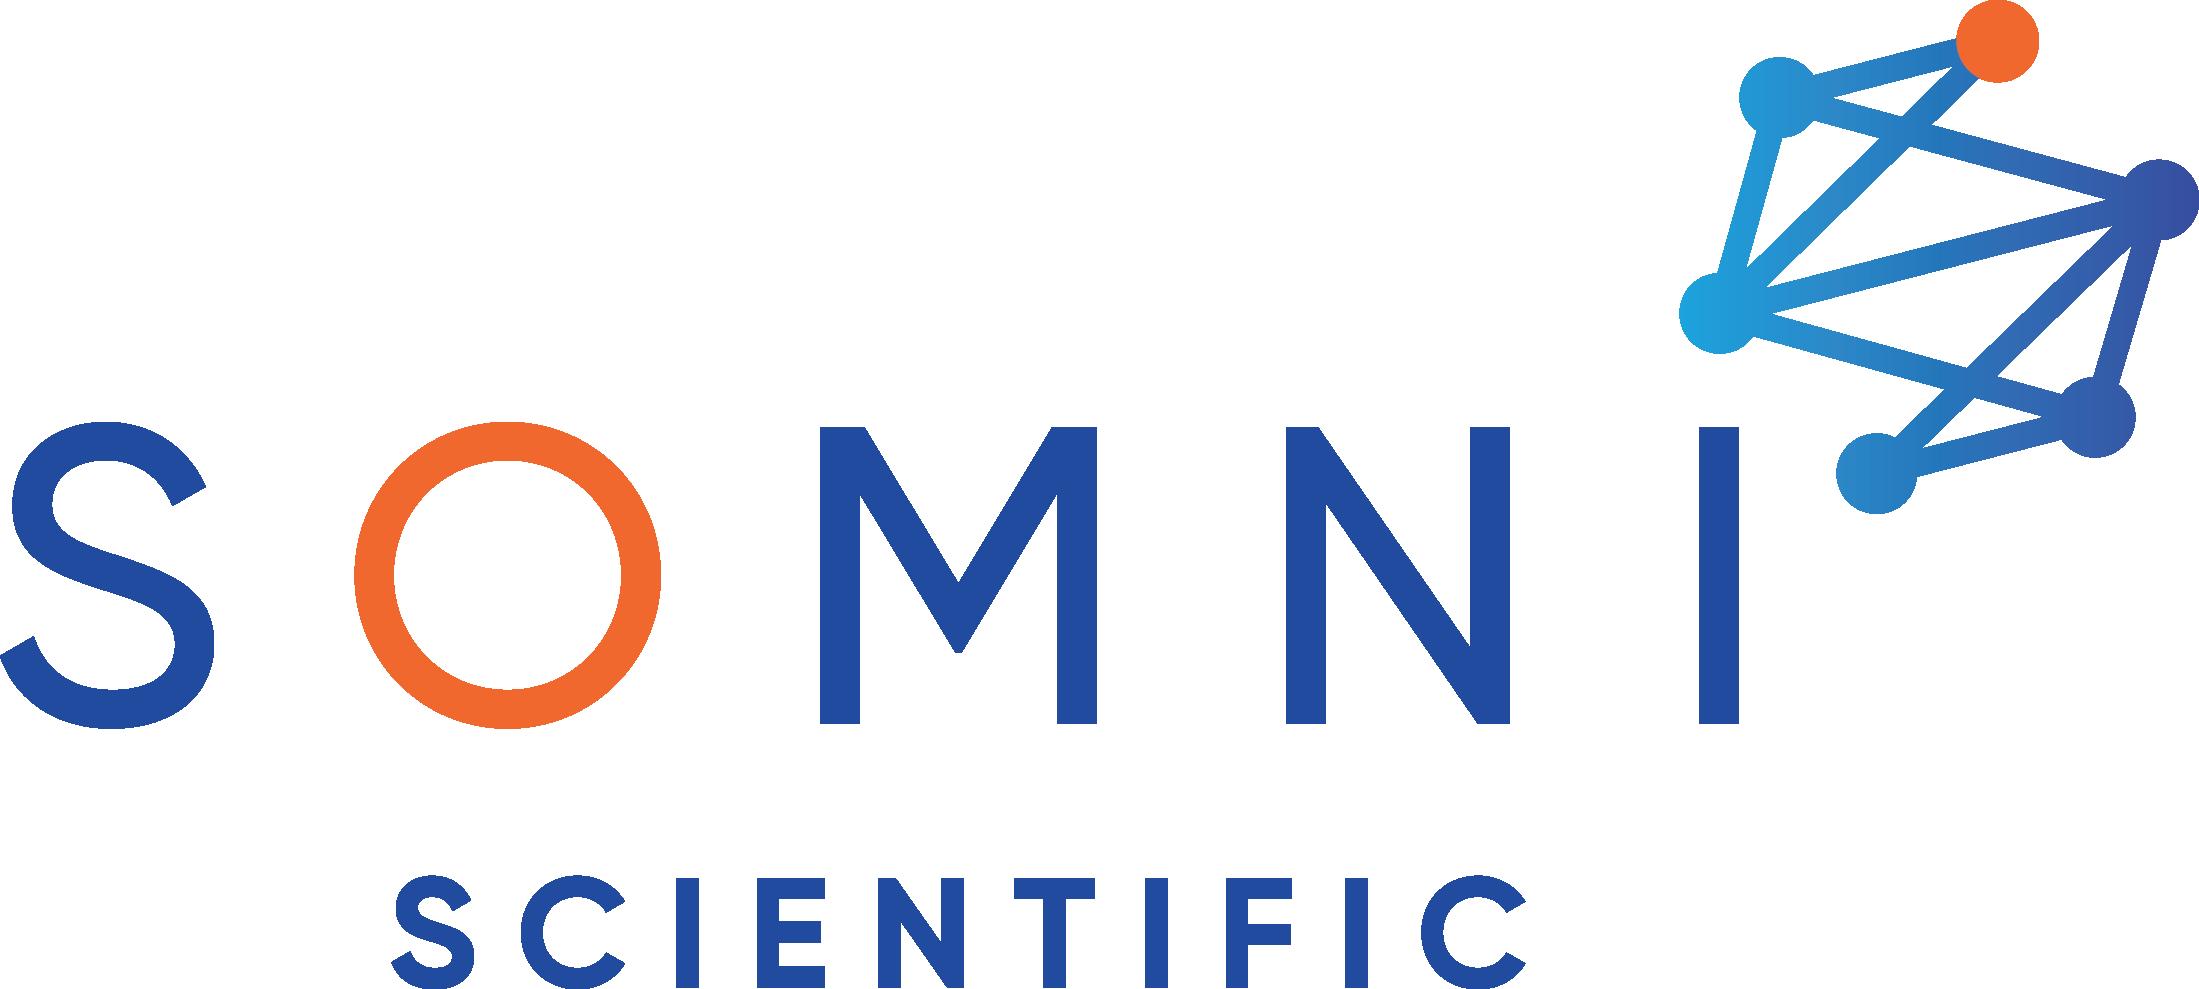 SOMNI_Scientific_logo_CMYK